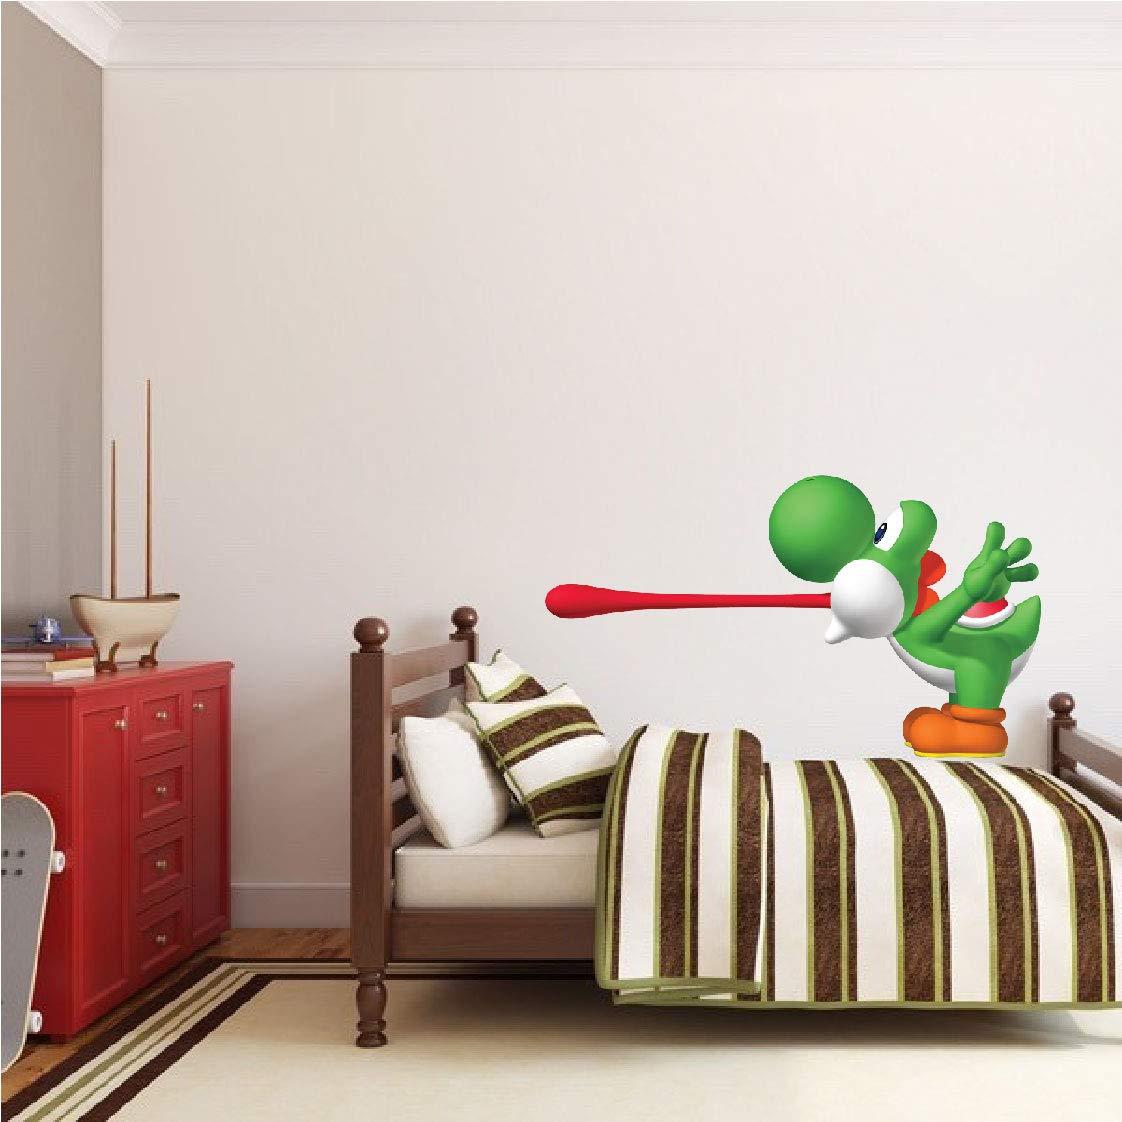 Amazon.com: Prime Decals Yoshi Mario Wall Sticker for ...